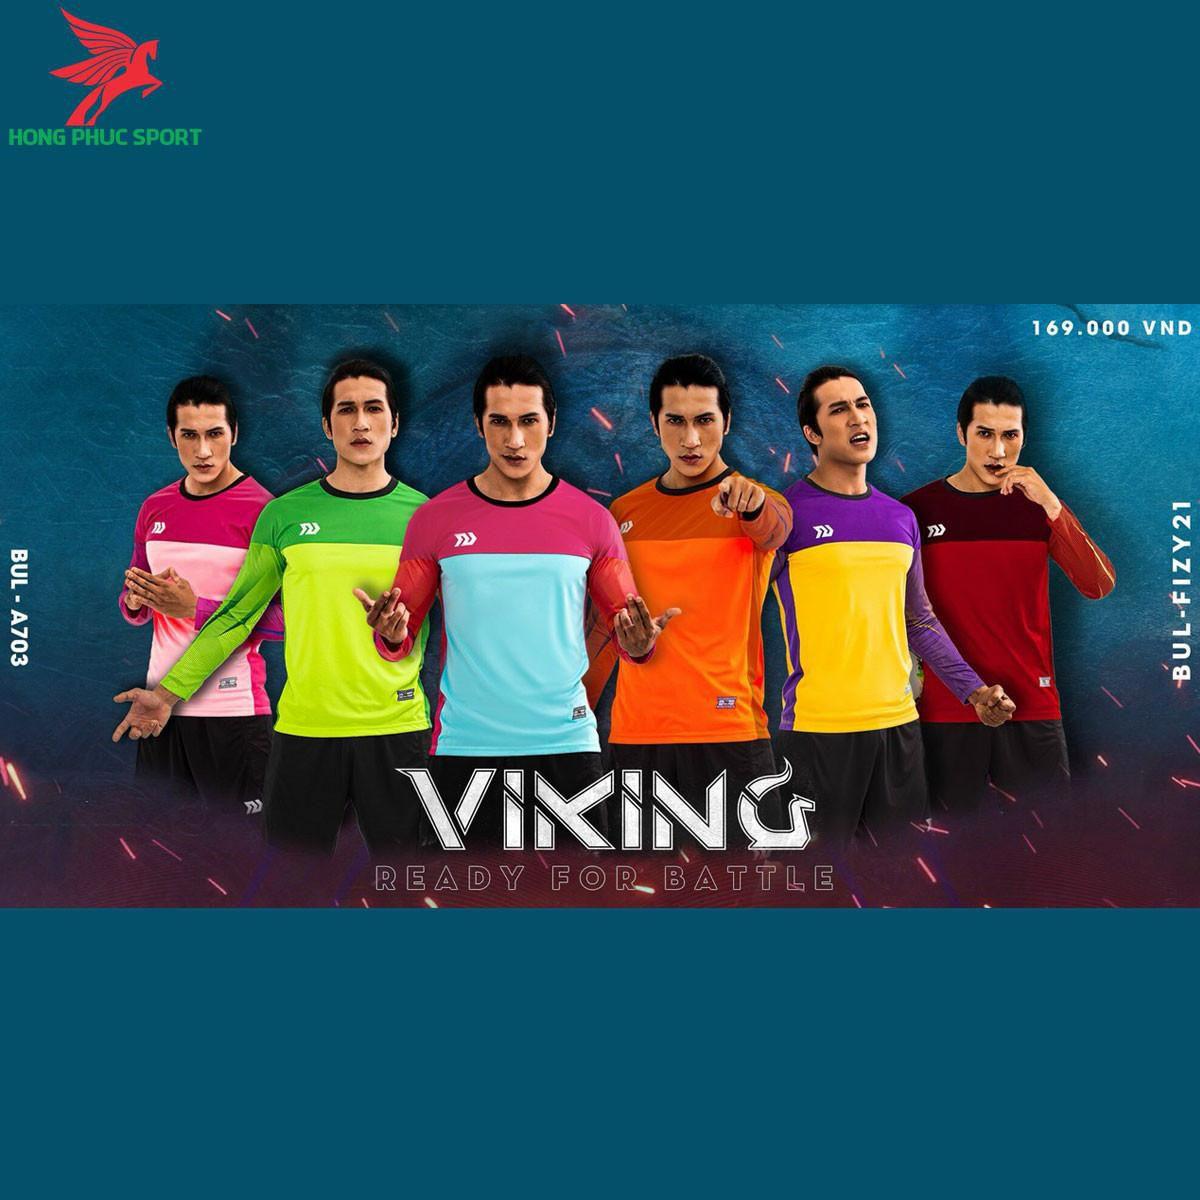 https://cdn.hongphucsport.com/unsafe/s4.shopbay.vn/files/285/ao-thu-mon-khong-logo-bulbal-viking-2-605161c8523ef.jpg